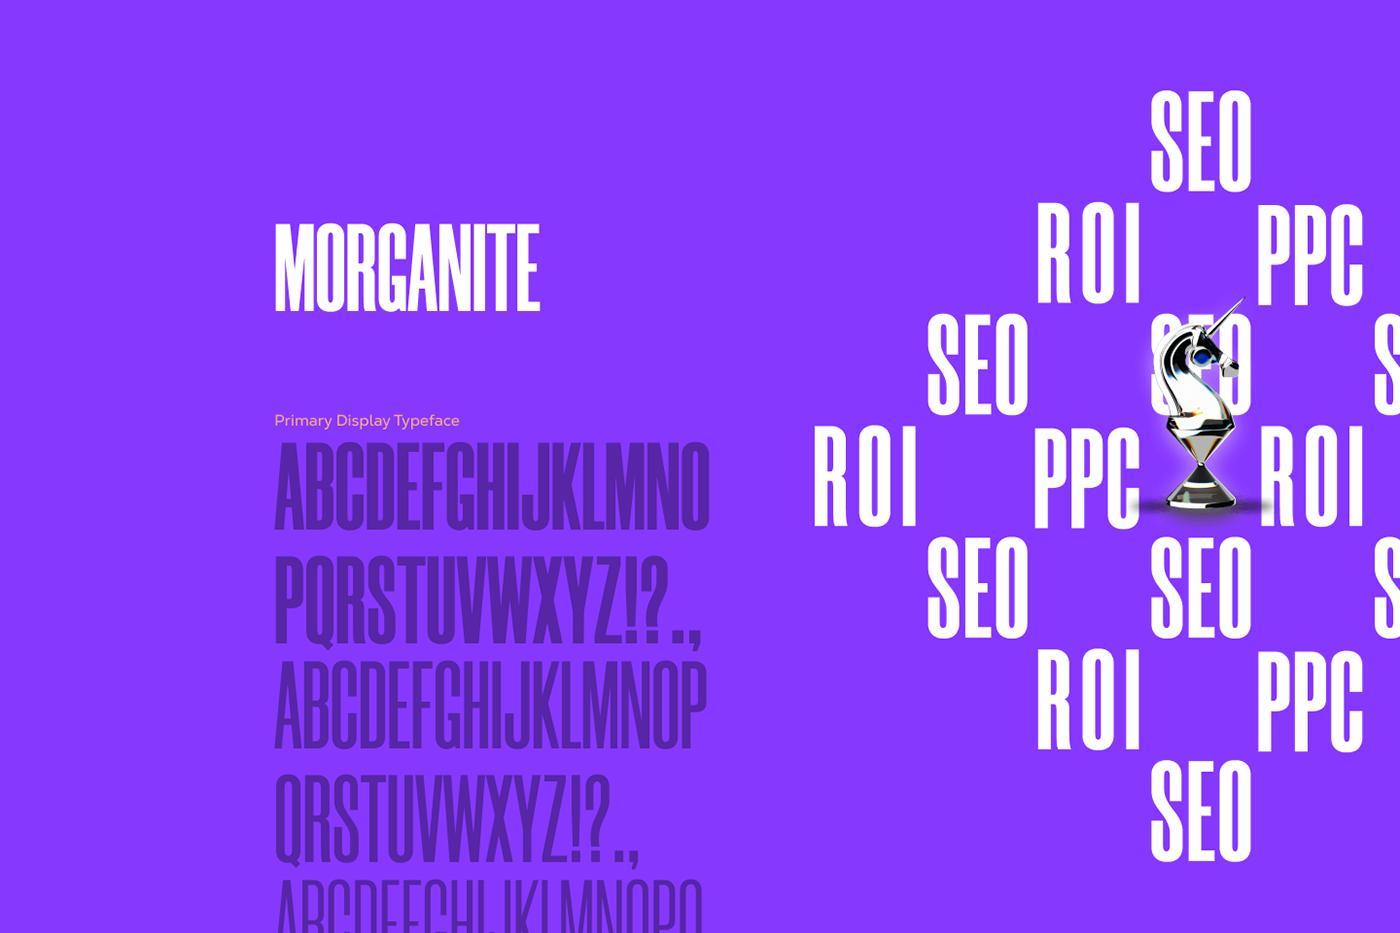 agency bulgaria digital marketing growth marketing   ppc ROI SEO Technology